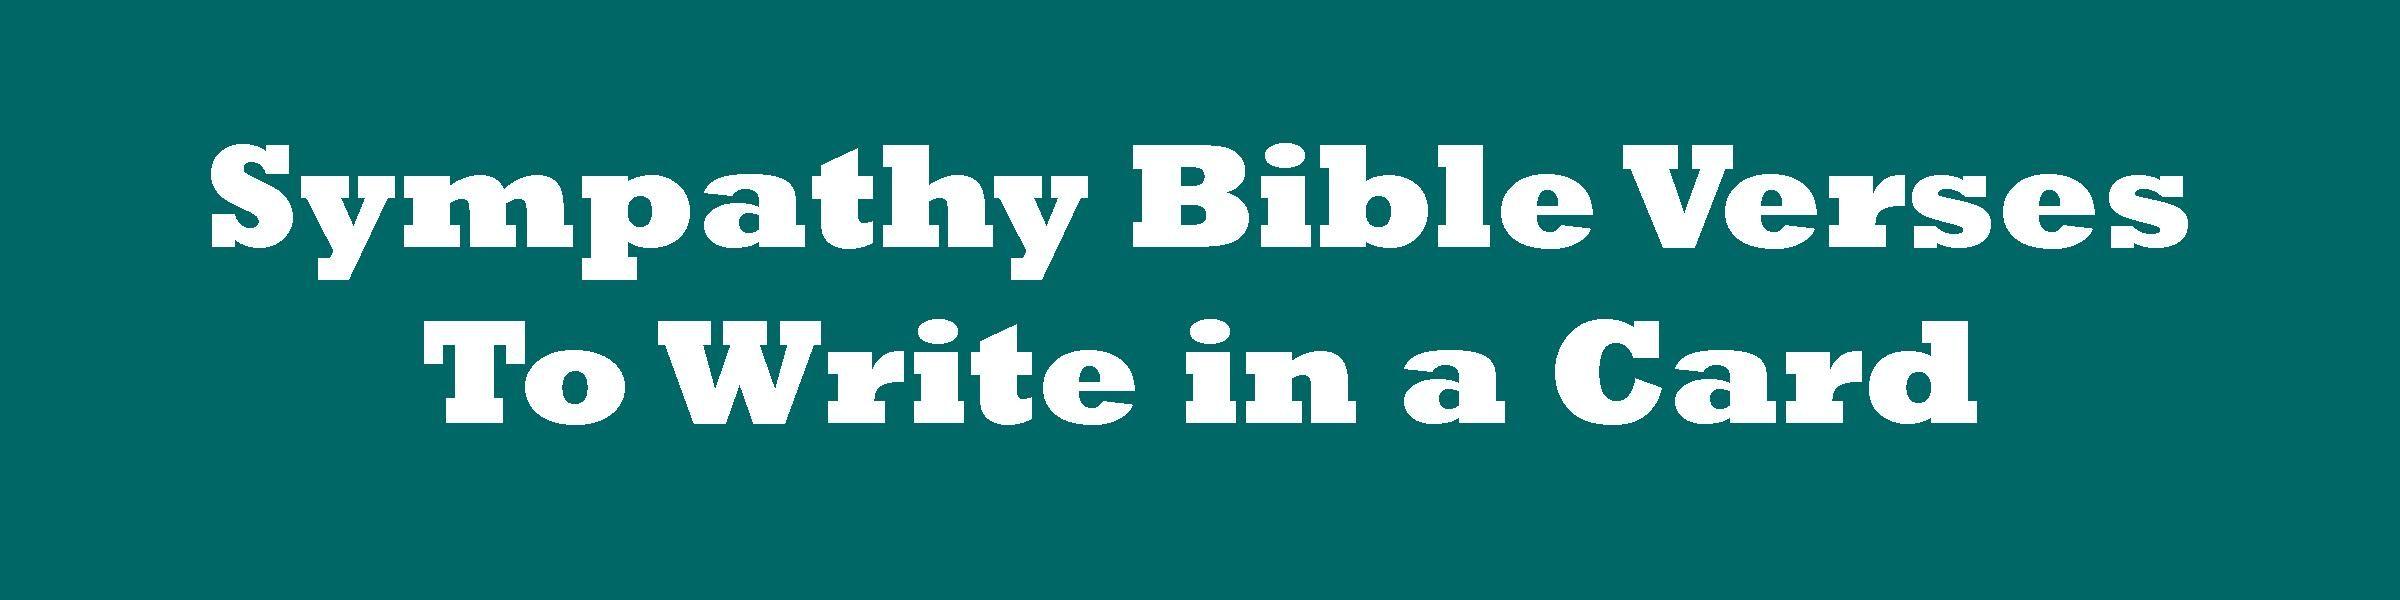 Christian condolences bible verses and sympathy messages verses christian condolences bible verses and sympathy messages kristyandbryce Choice Image